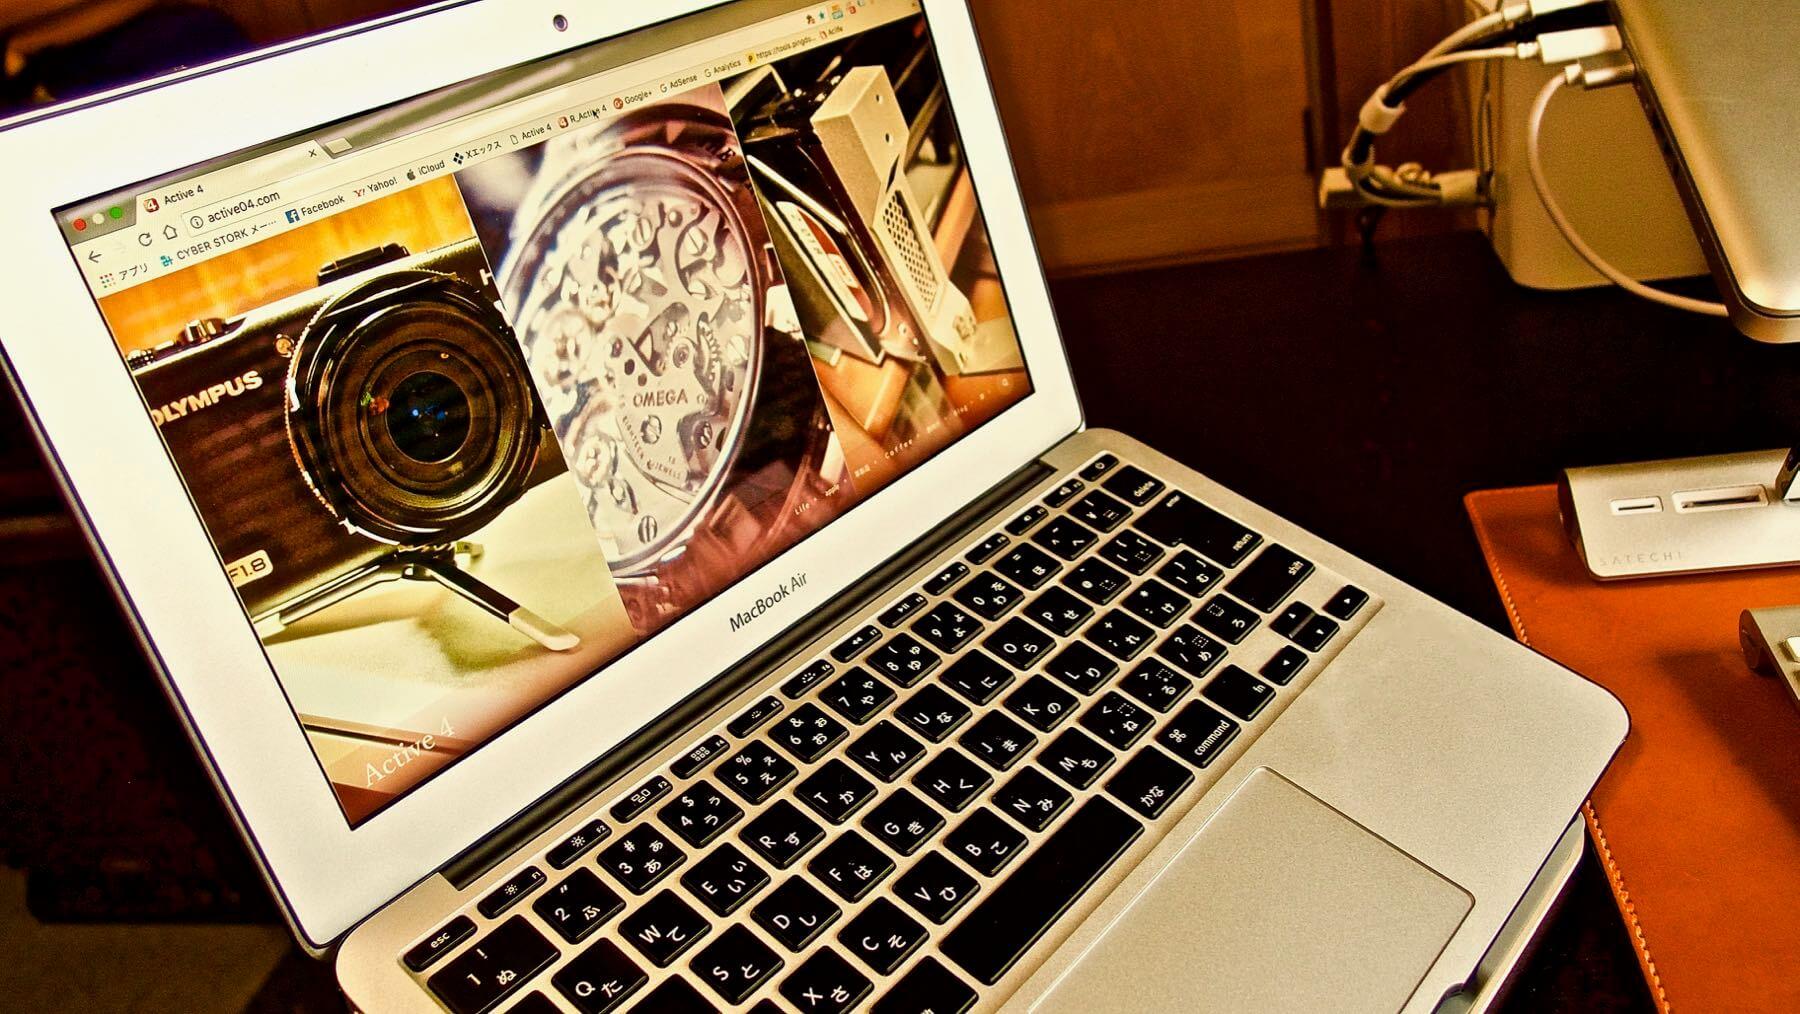 02 MacBook Air 2013 11inch